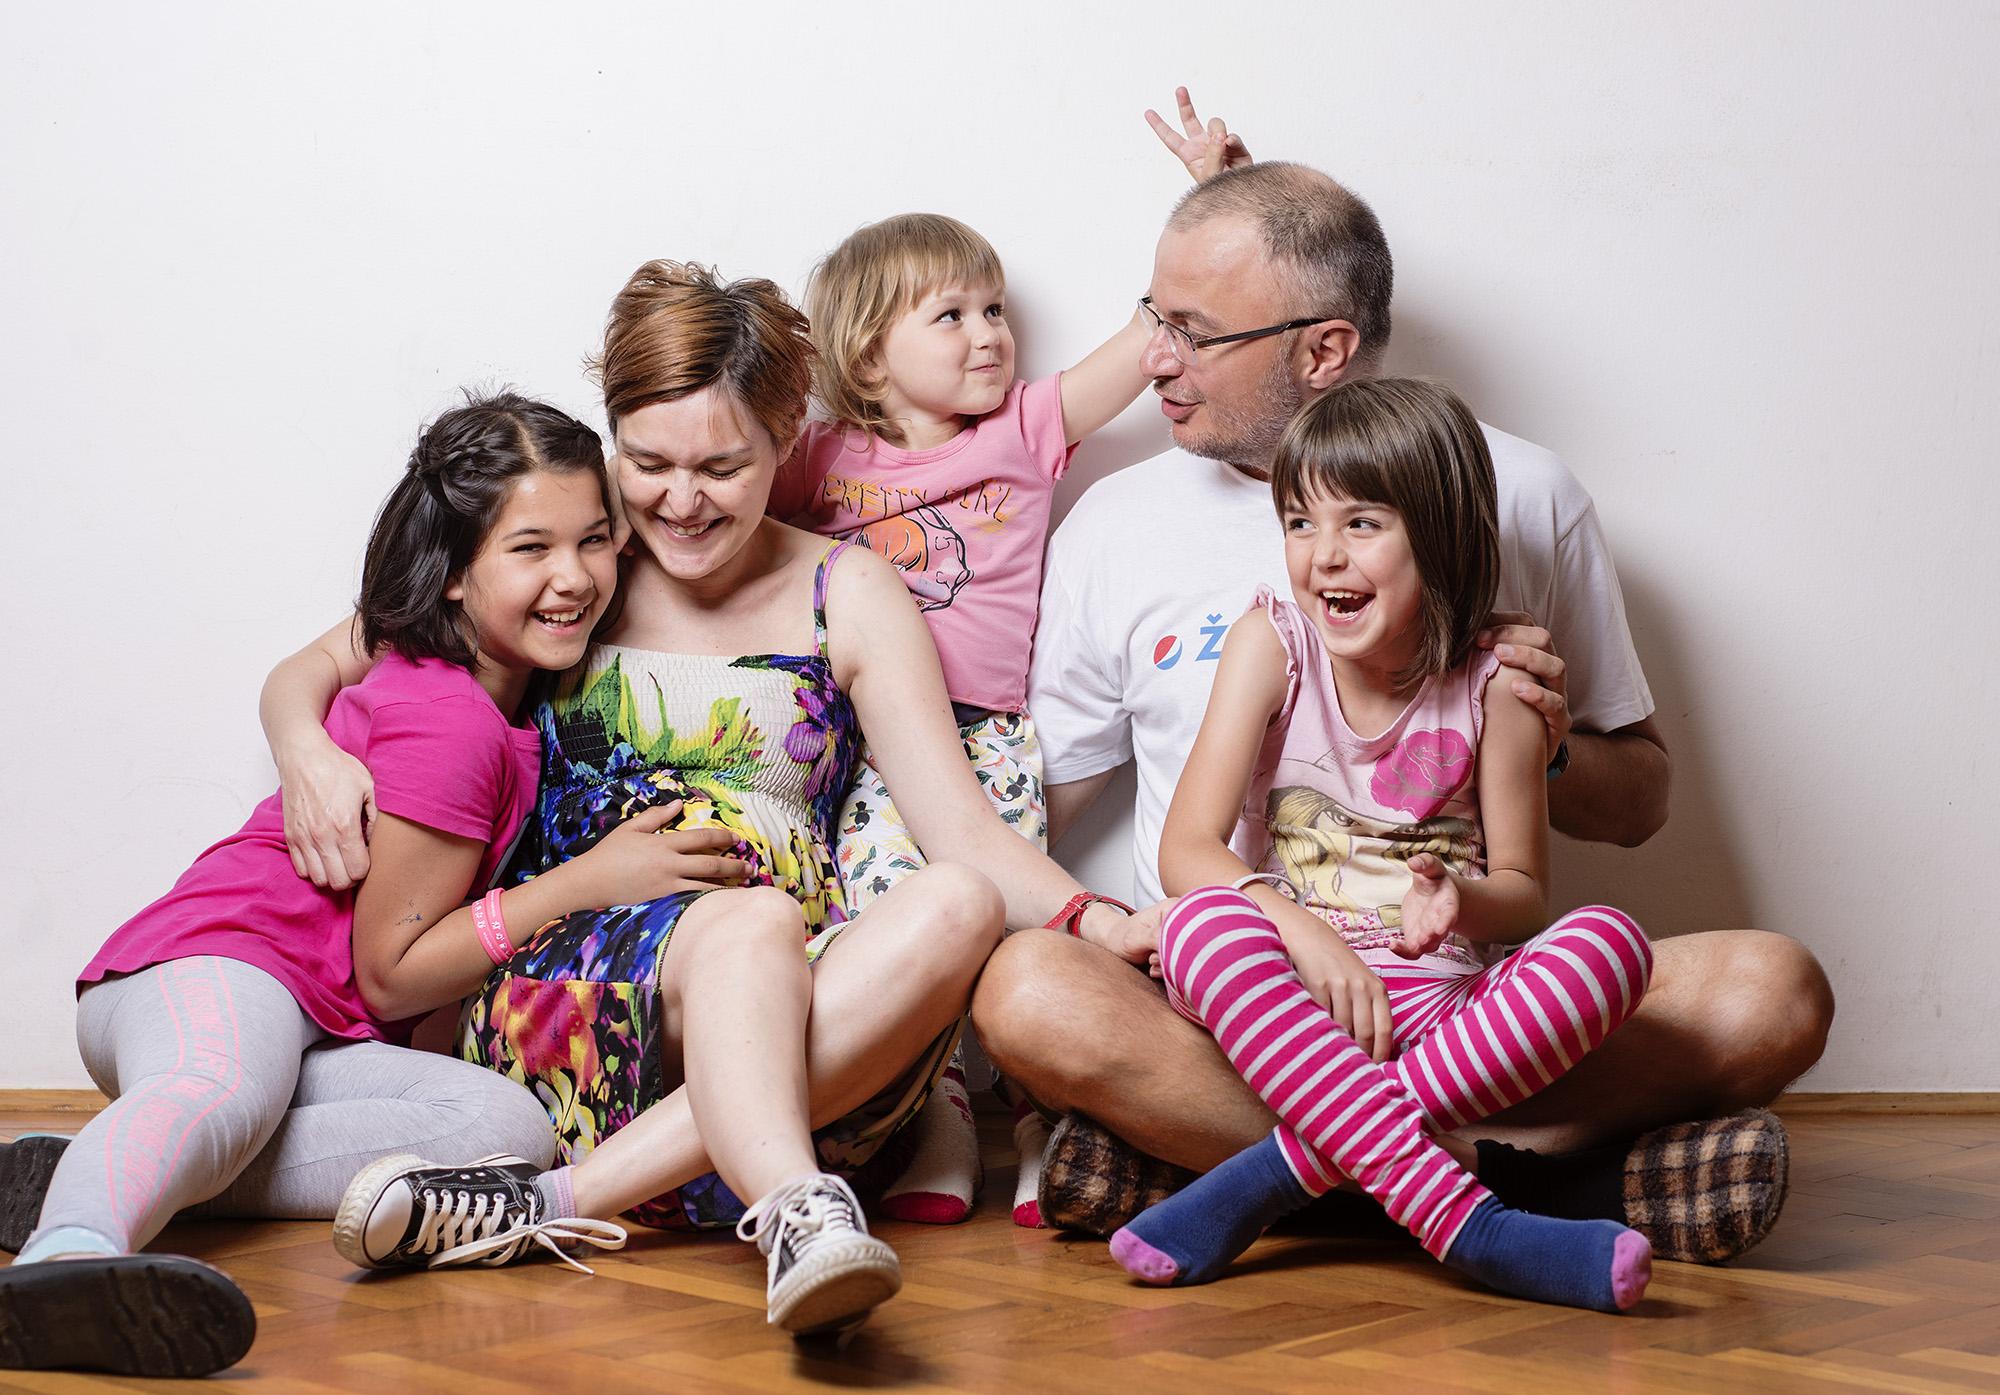 Obitelj Prpa pozira Telegramovom uredniku fotografije